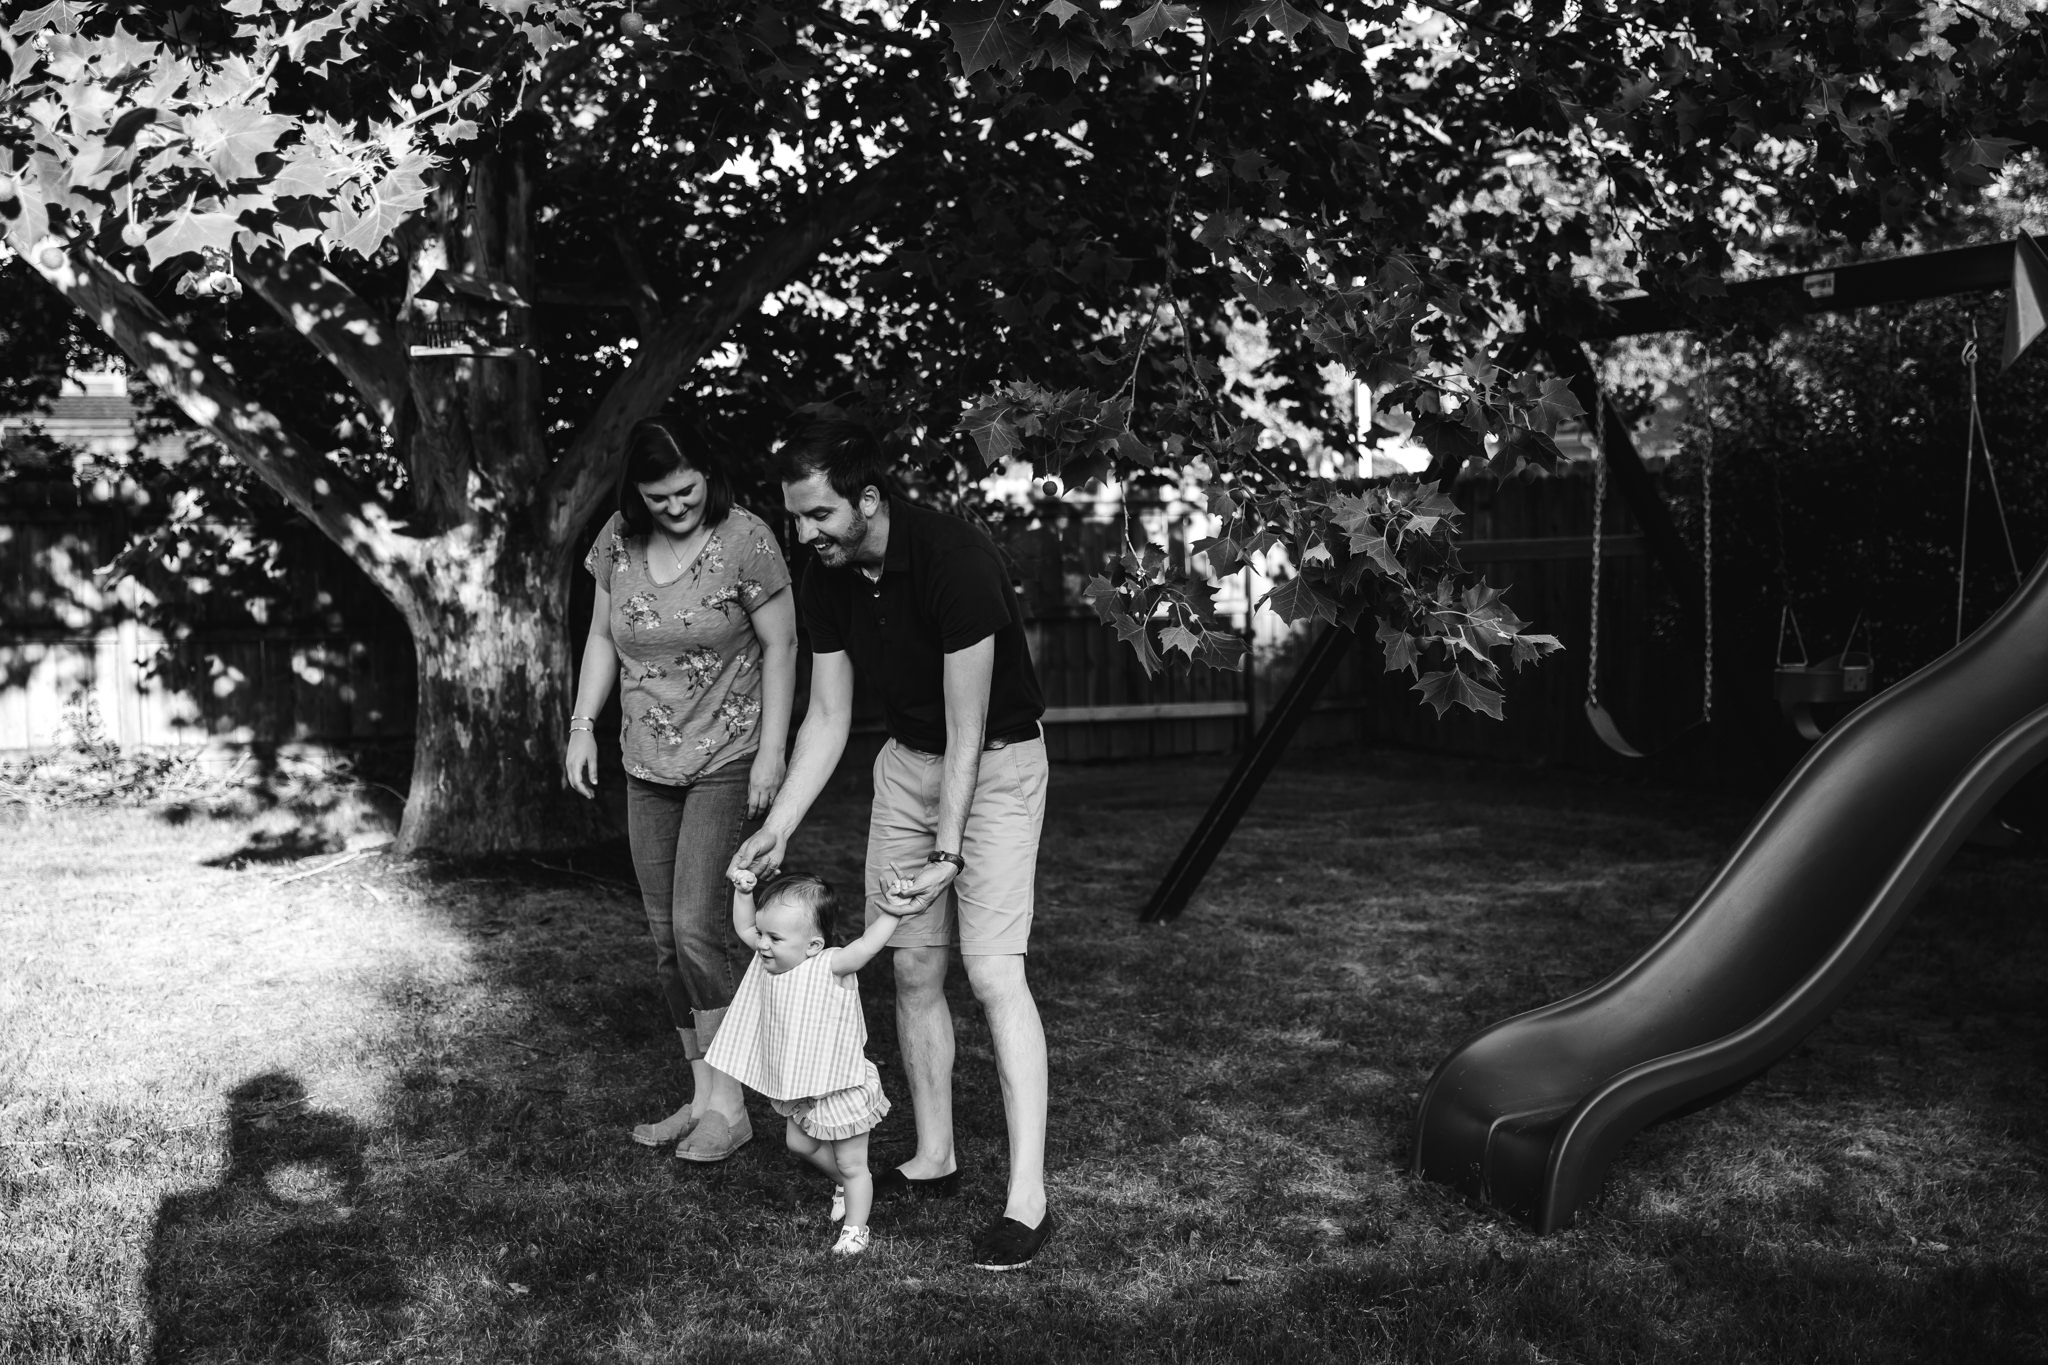 memphis-family-photographer-wiley-family-7.jpg